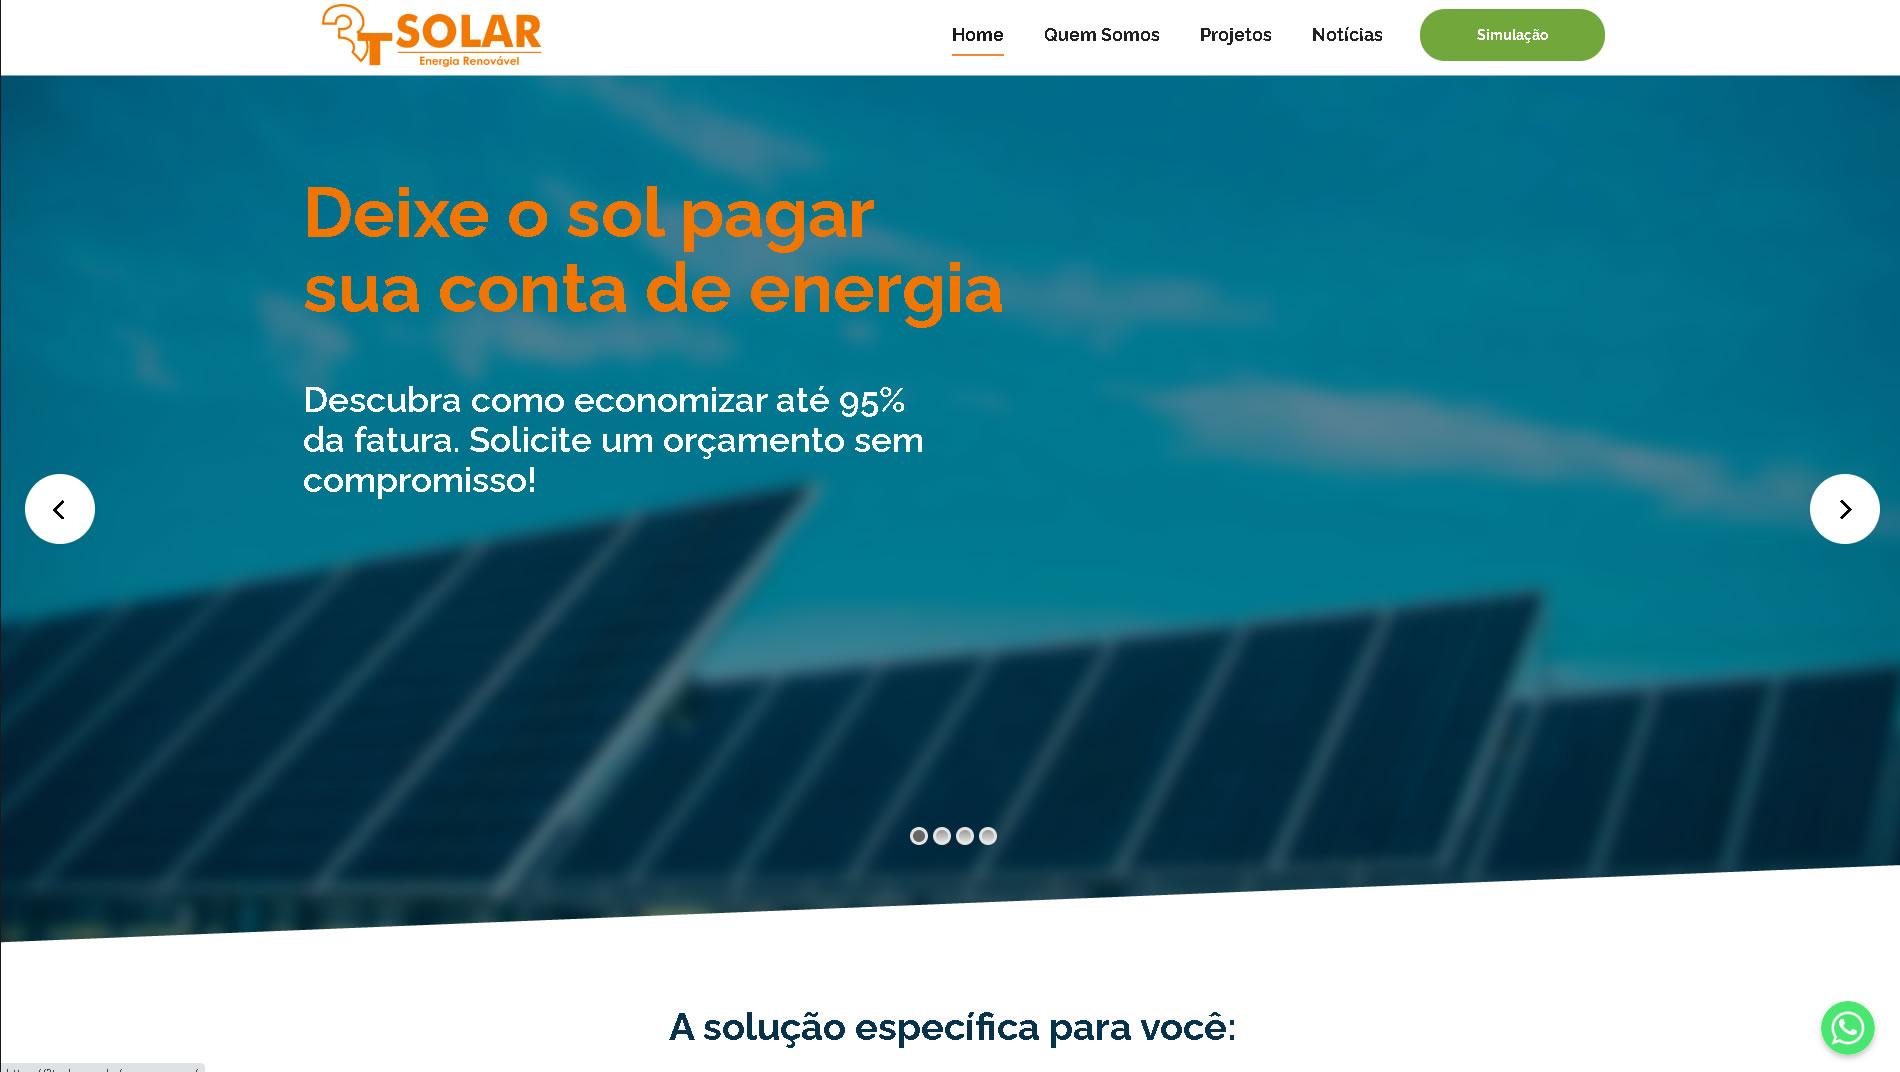 3t Solar